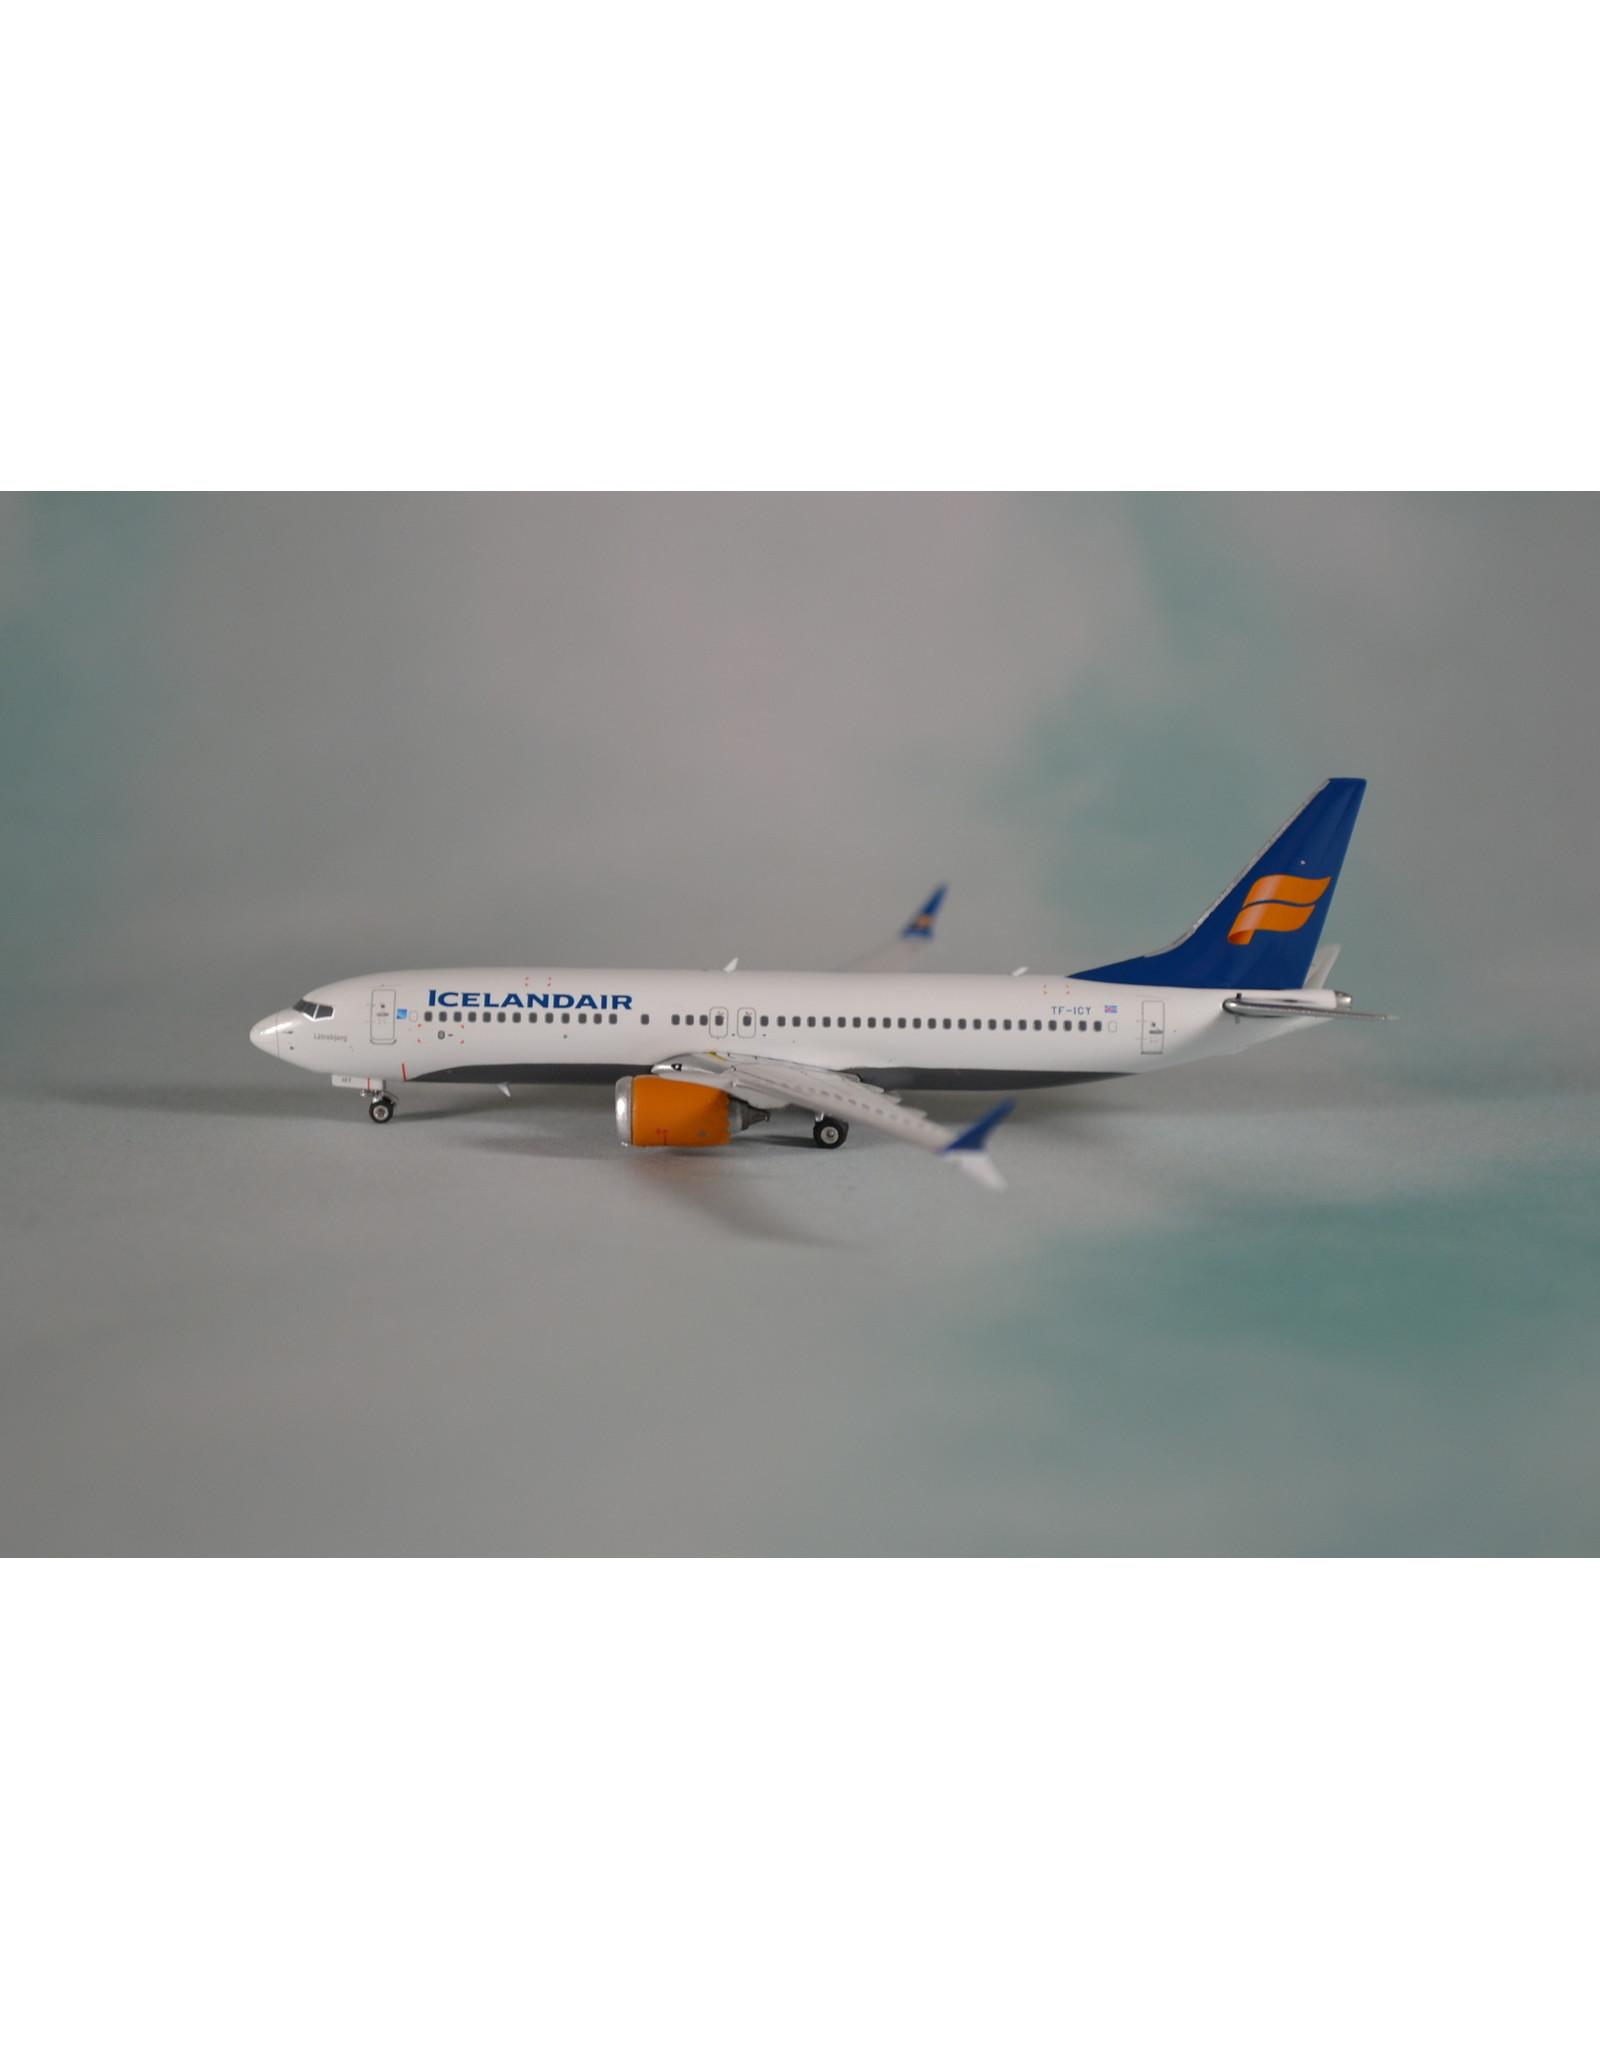 PH4 Icelandair 737max8 TF-ICY